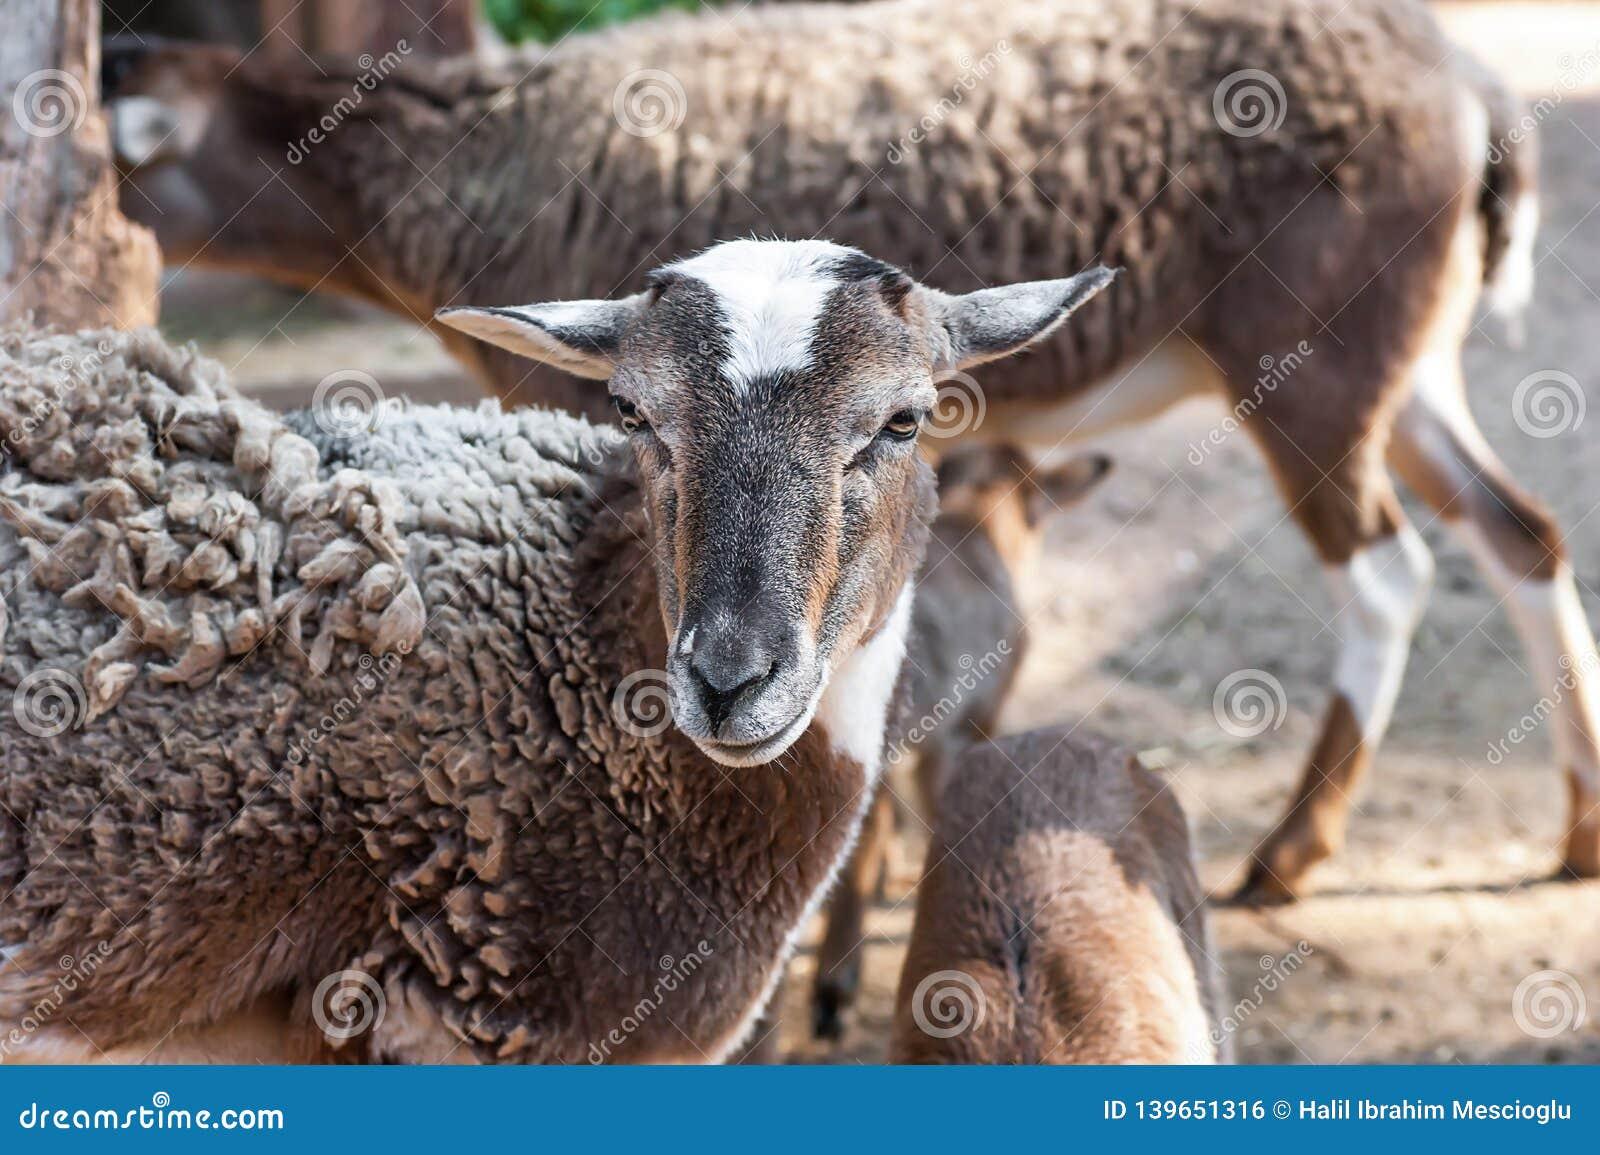 Sheep for the Feast of Sacrifice Muslim holiday kurban